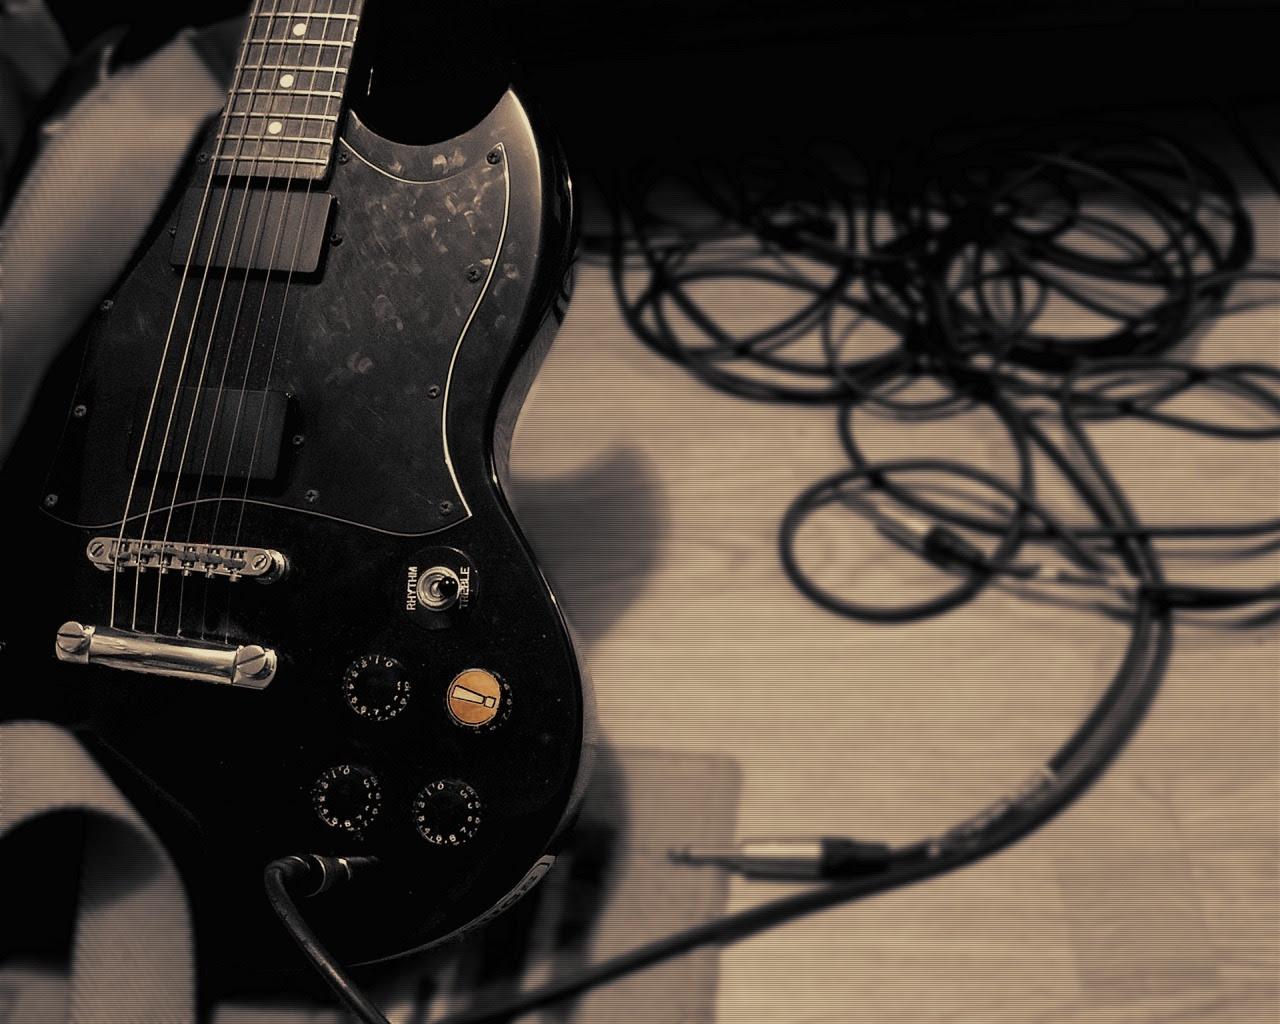 http://25.media.tumblr.com/tumblr_m00u3jziTG1rq61u2o1_1280.jpg